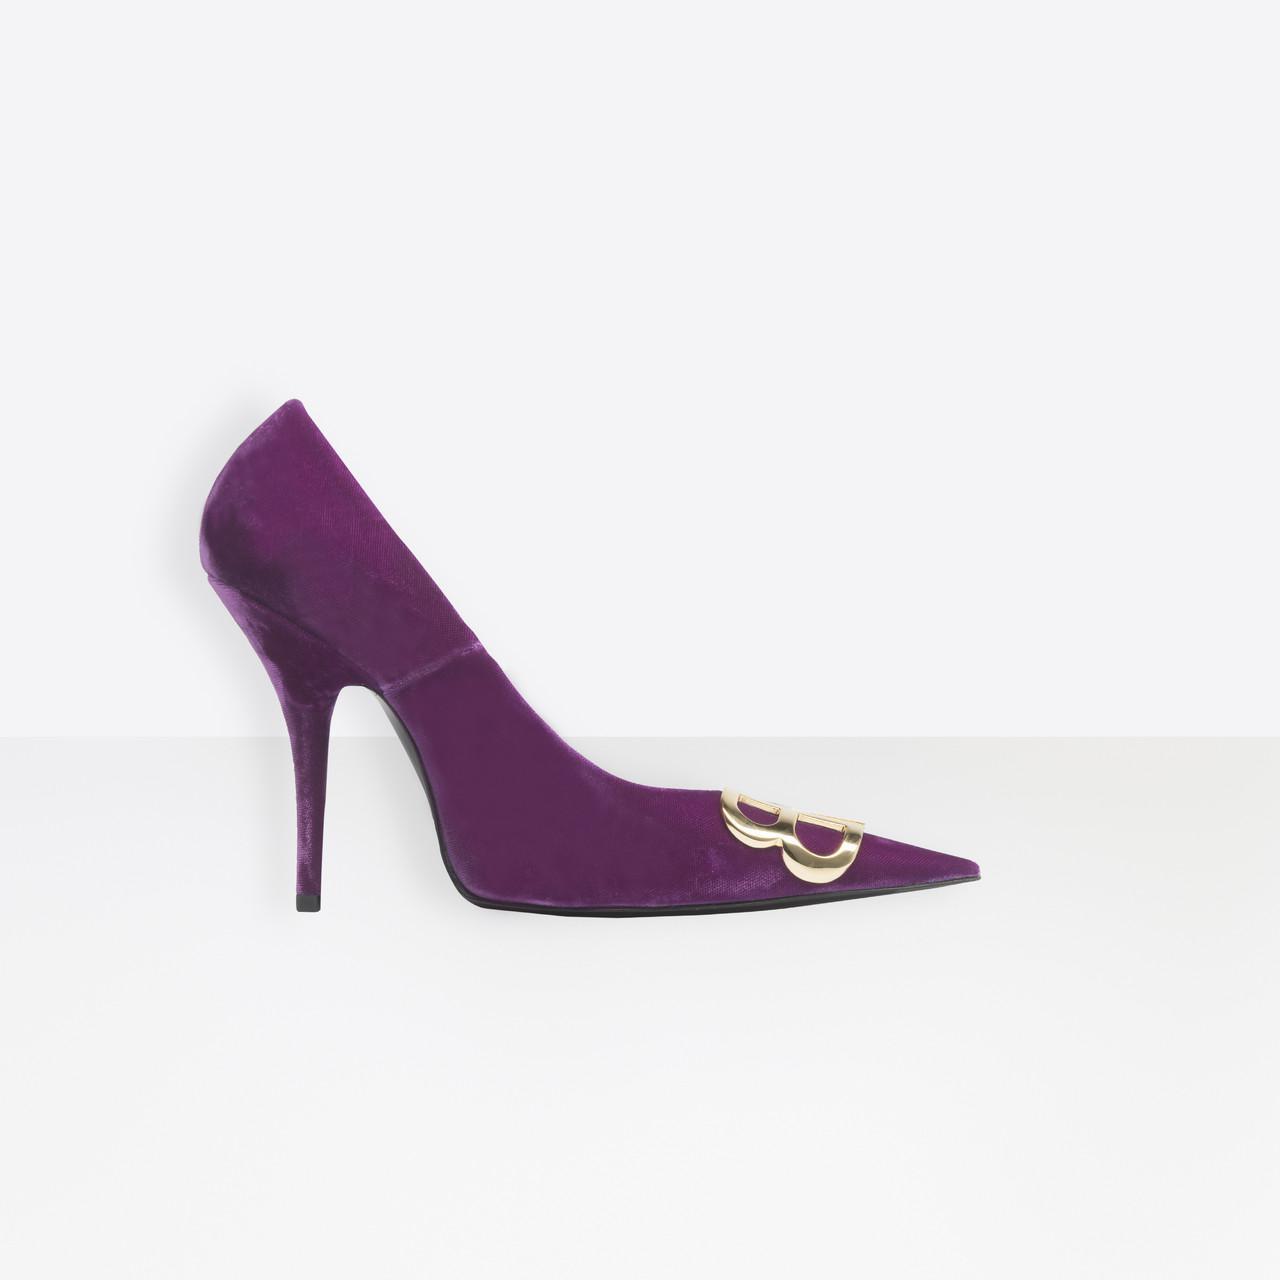 b7c86c4d33e Balenciaga Purple Bb Pumps Velvet